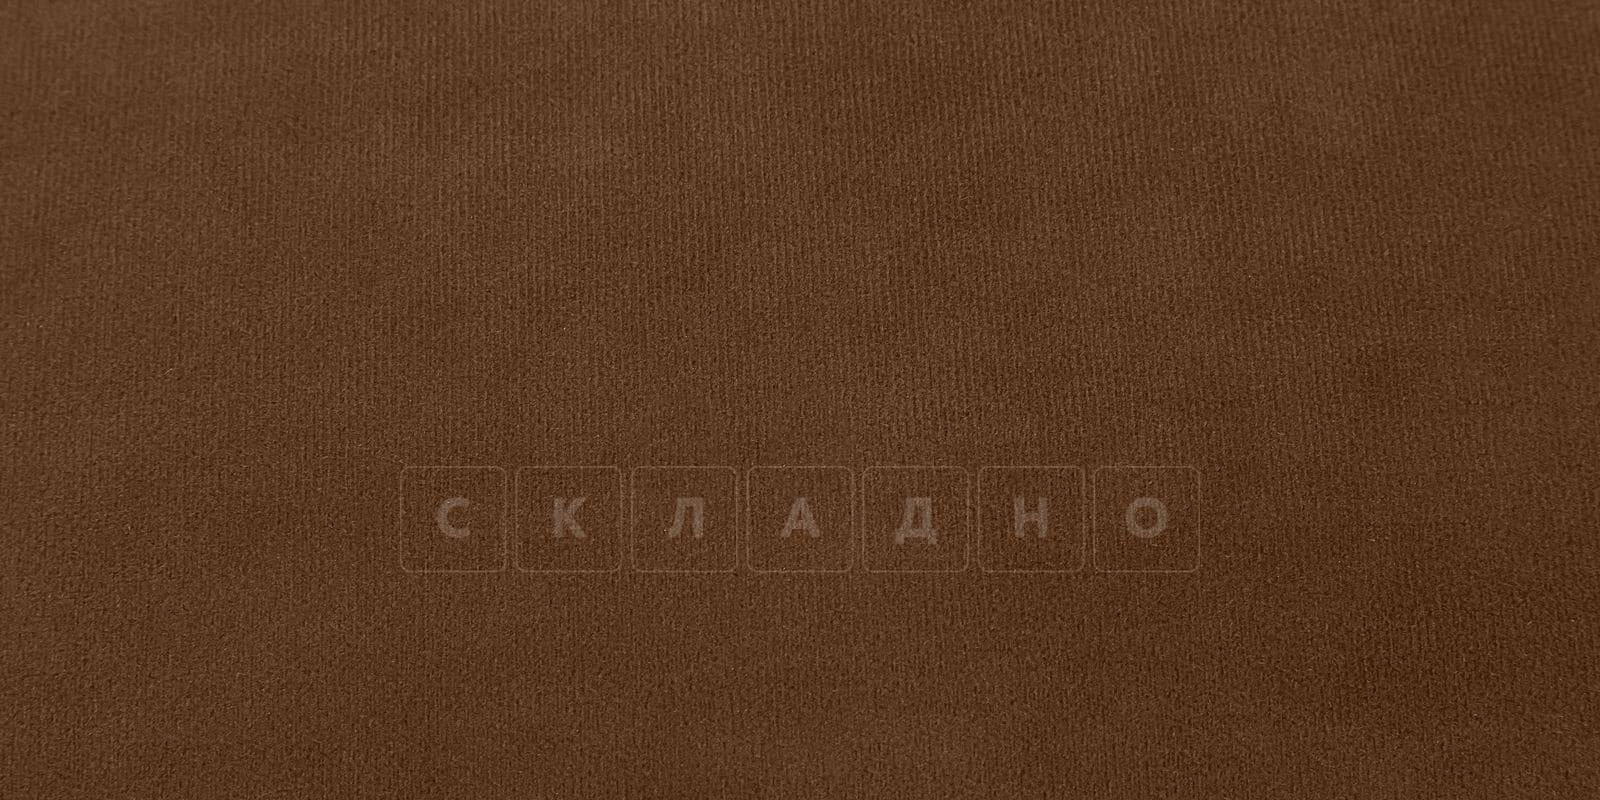 Диван Флэтфорд велюр коричневый фото 9 | интернет-магазин Складно